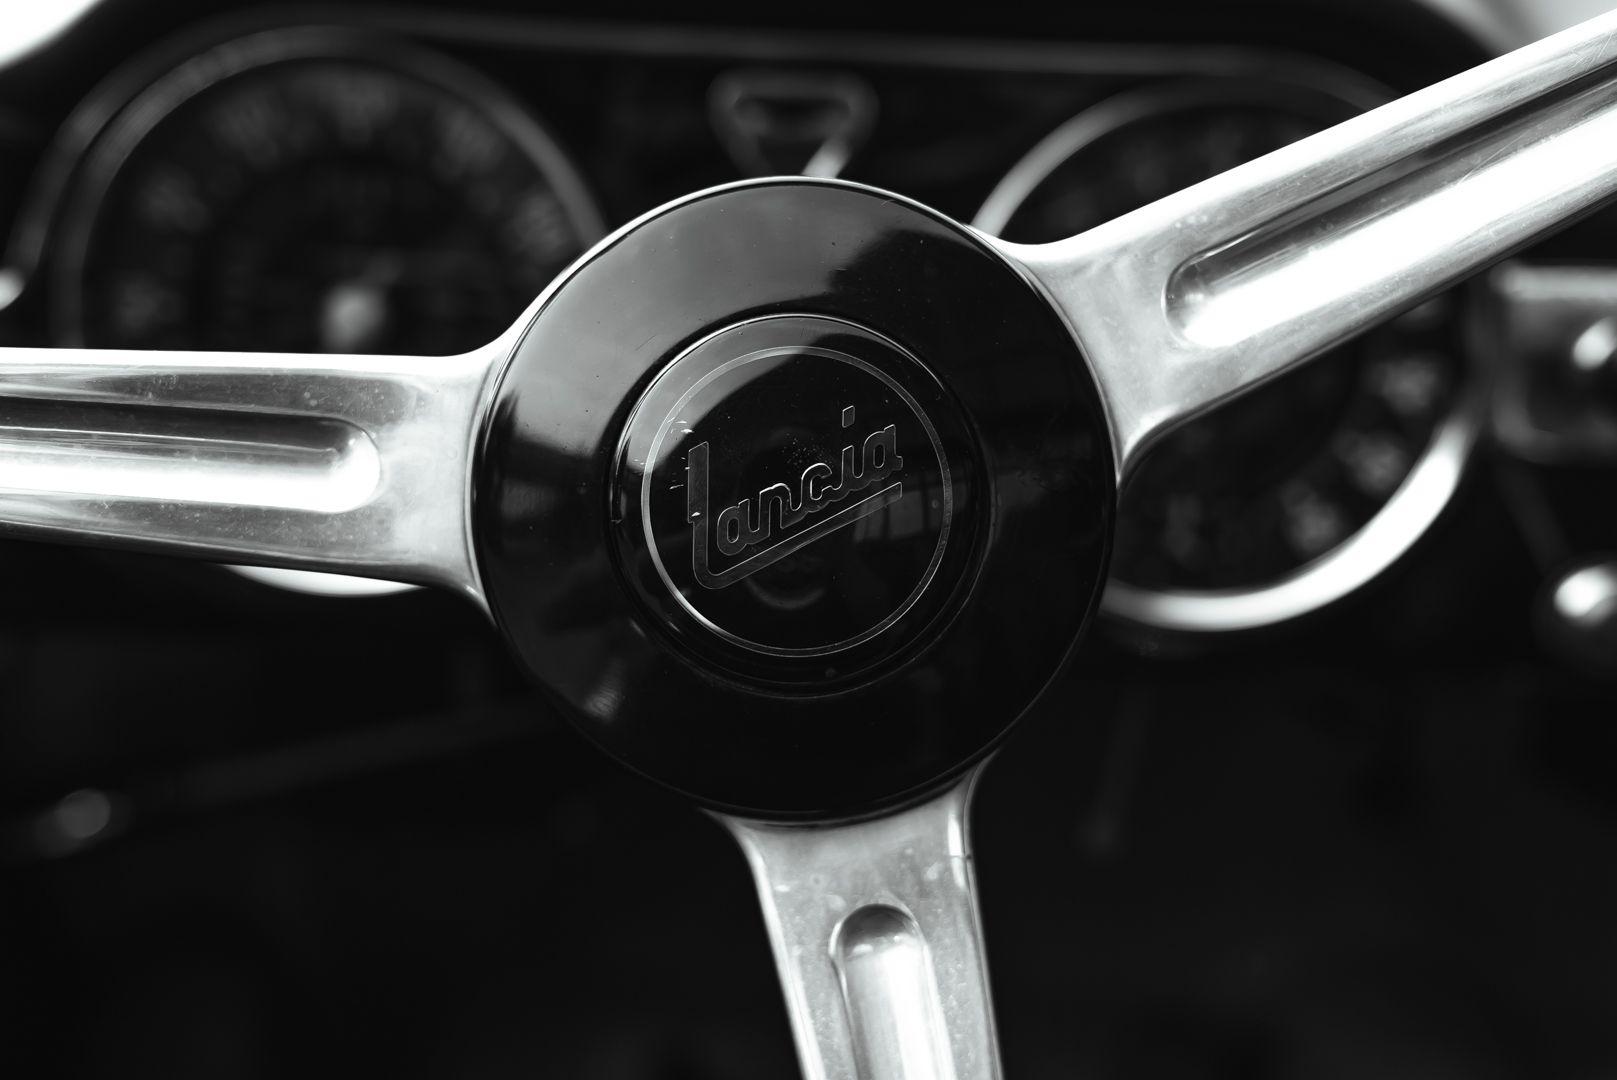 1968 Lancia Flaminia Touring Convertible 2800 3C 79145